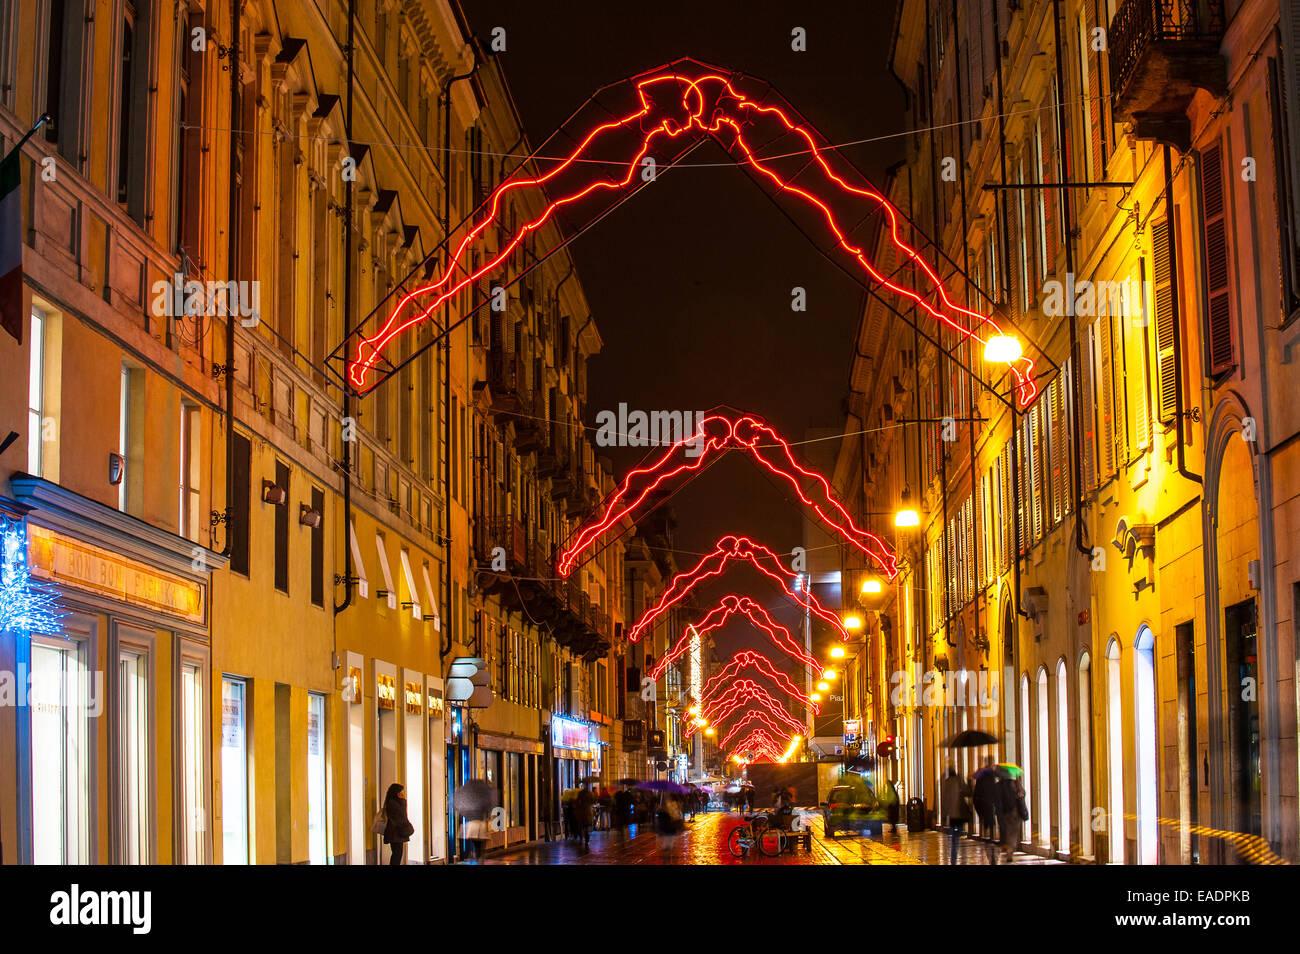 Torino, Italia. Xii Nov, 2014. Italia Piemonte Torino ' Luci 'artista' in via Lagrange - Noi - da Luigi Immagini Stock